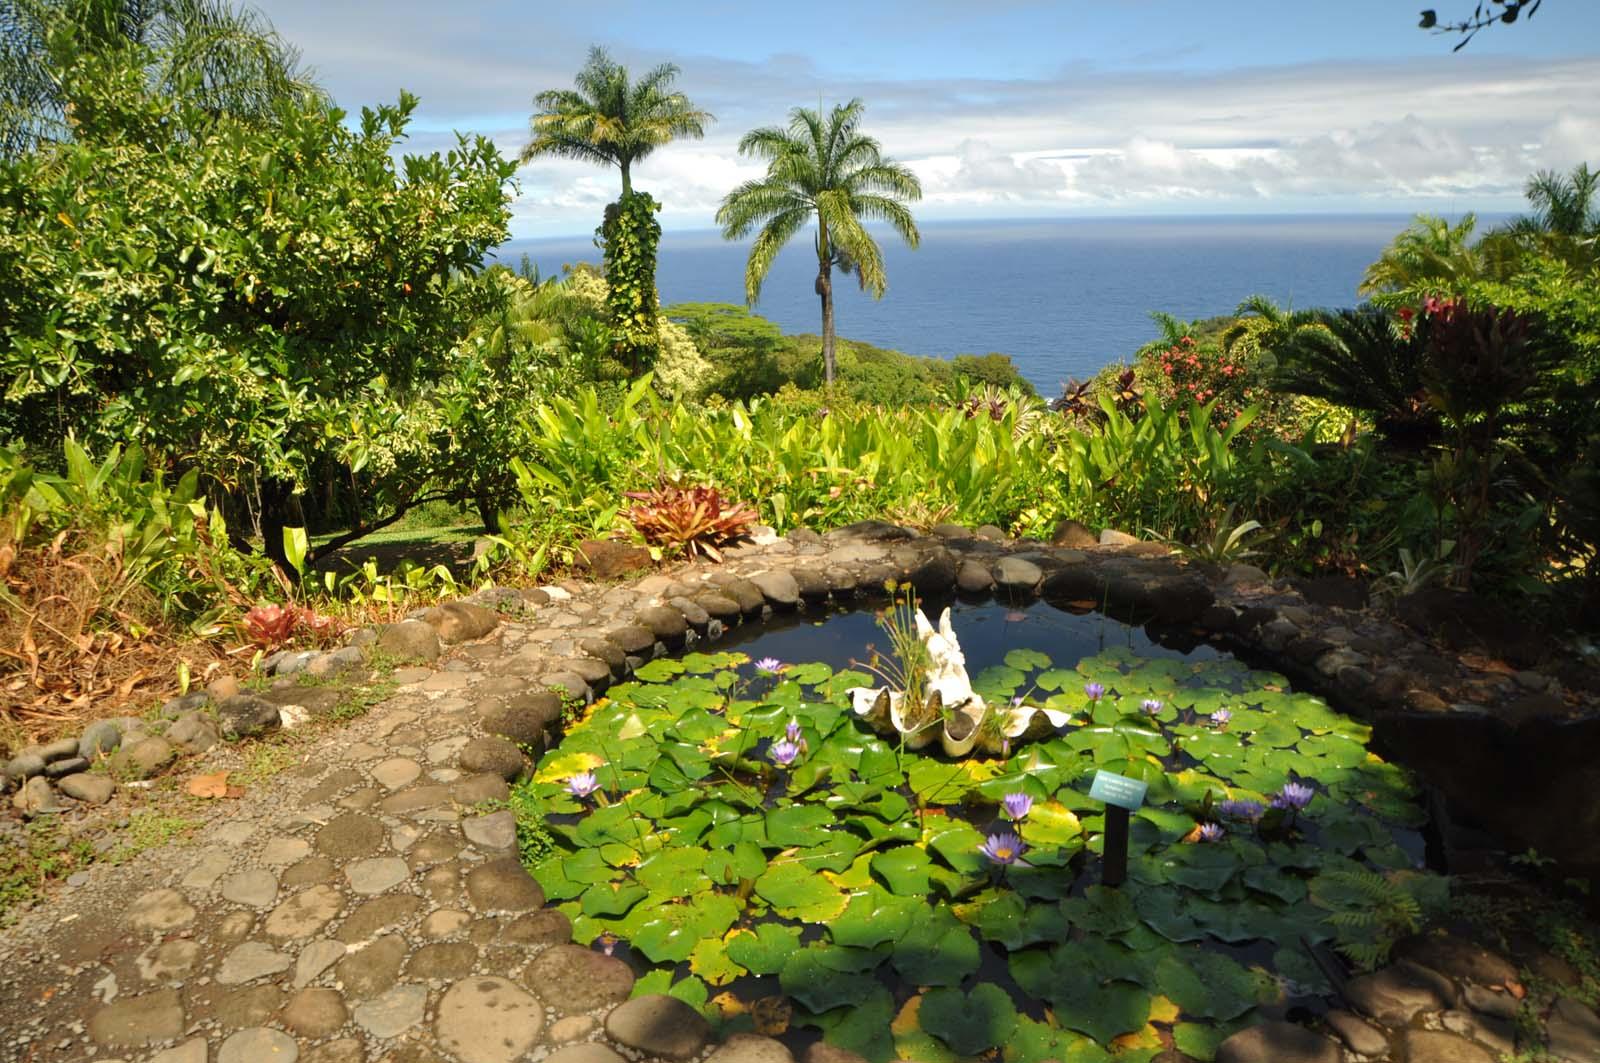 082_maui_hawaii_island